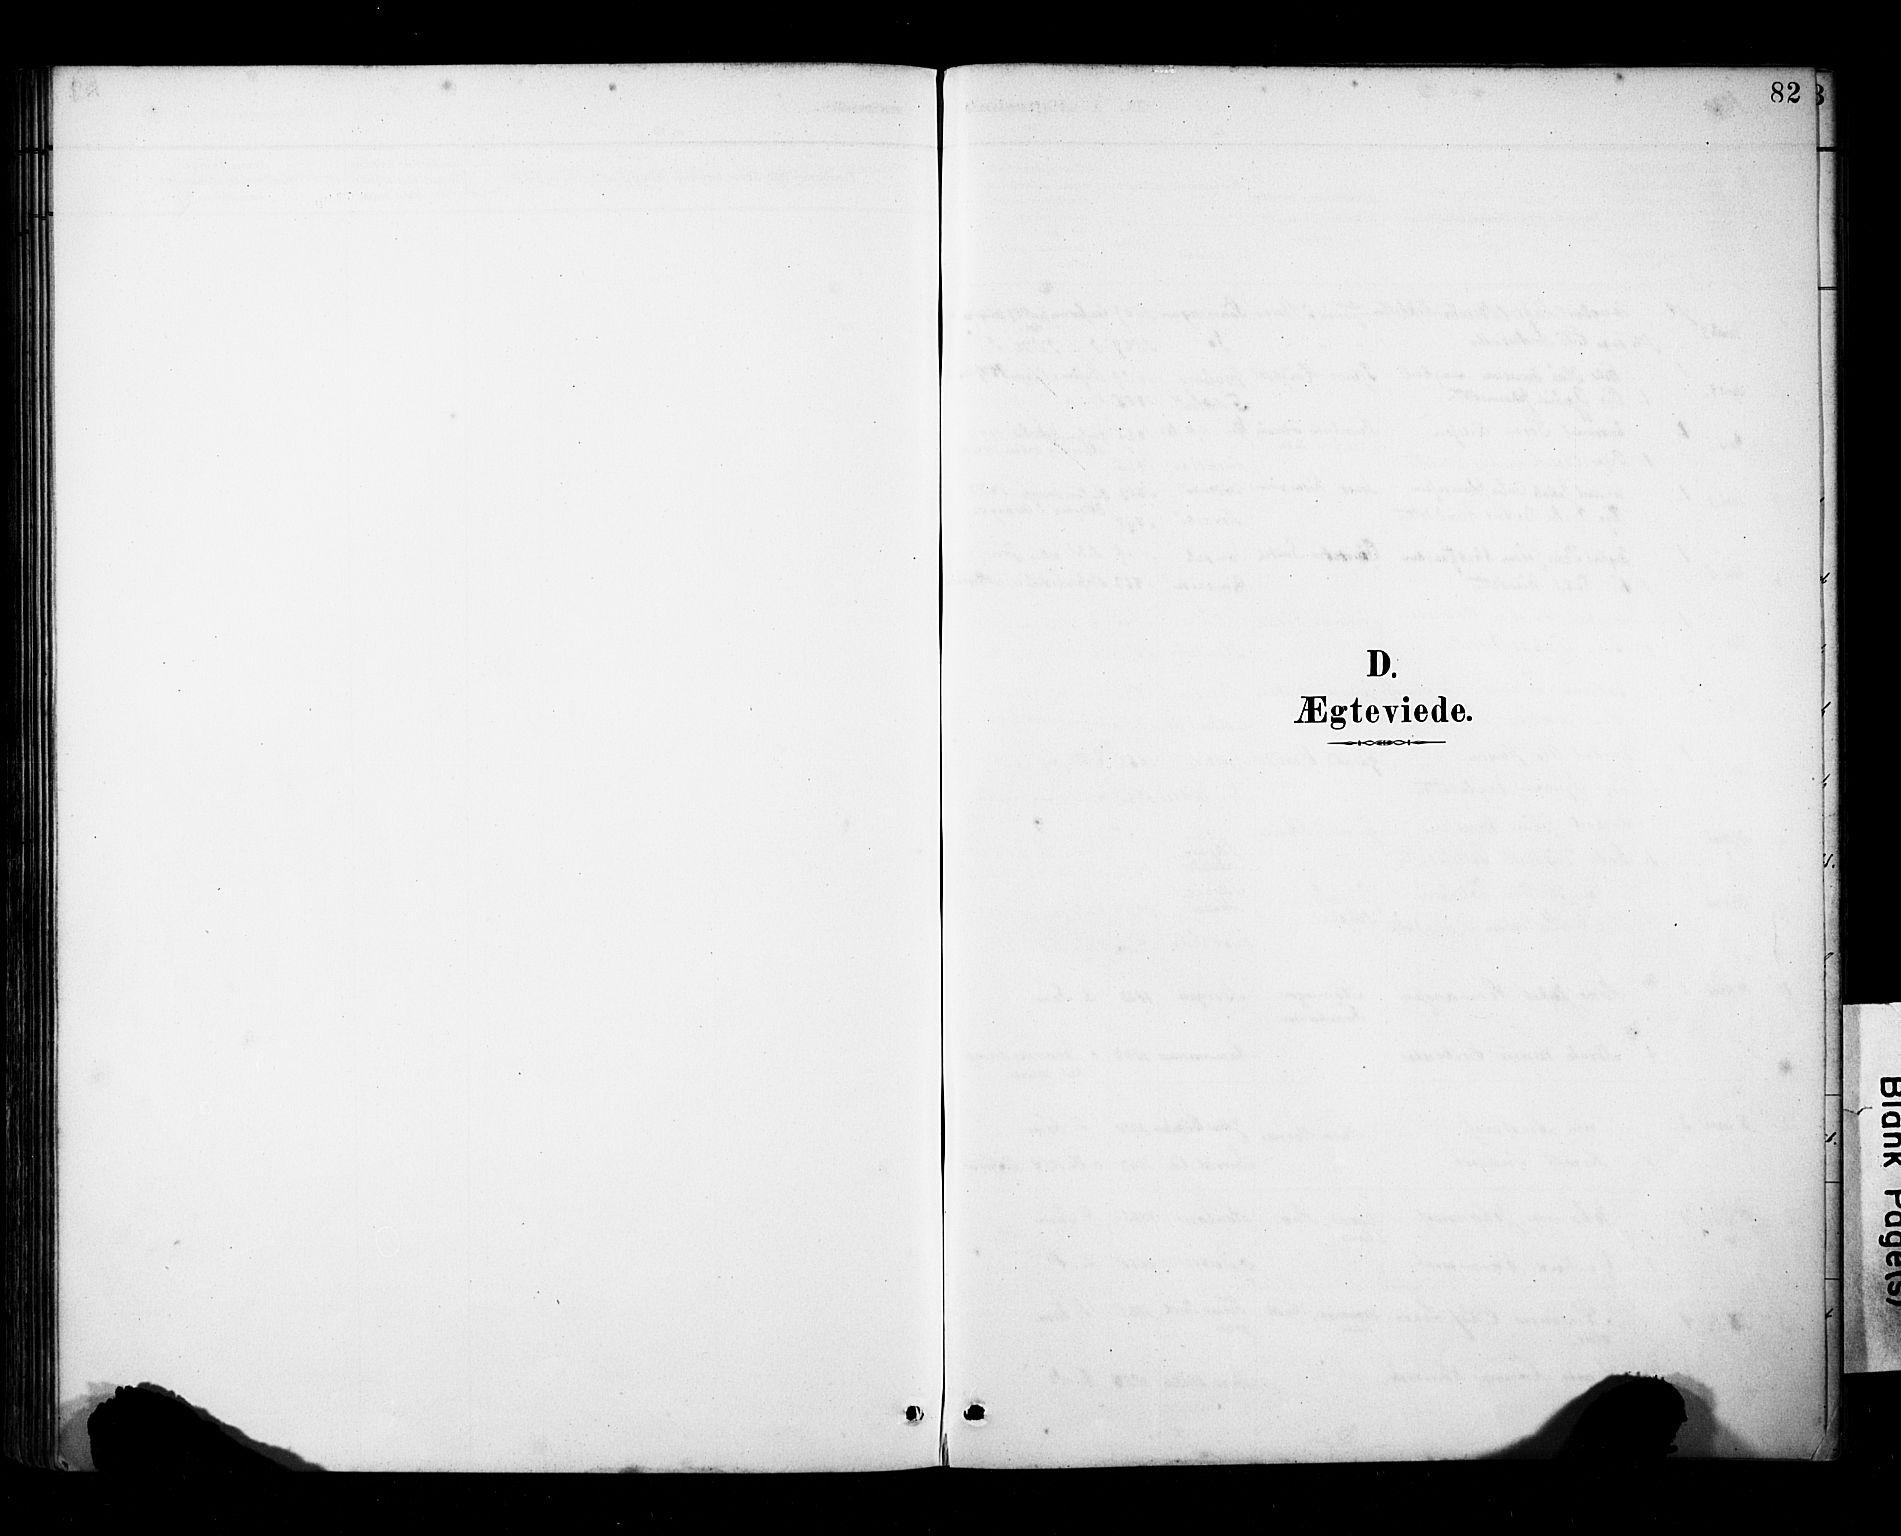 SAB, Fana Sokneprestembete, H/Haa/Haab/L0002: Ministerialbok nr. B 2, 1890-1897, s. 82